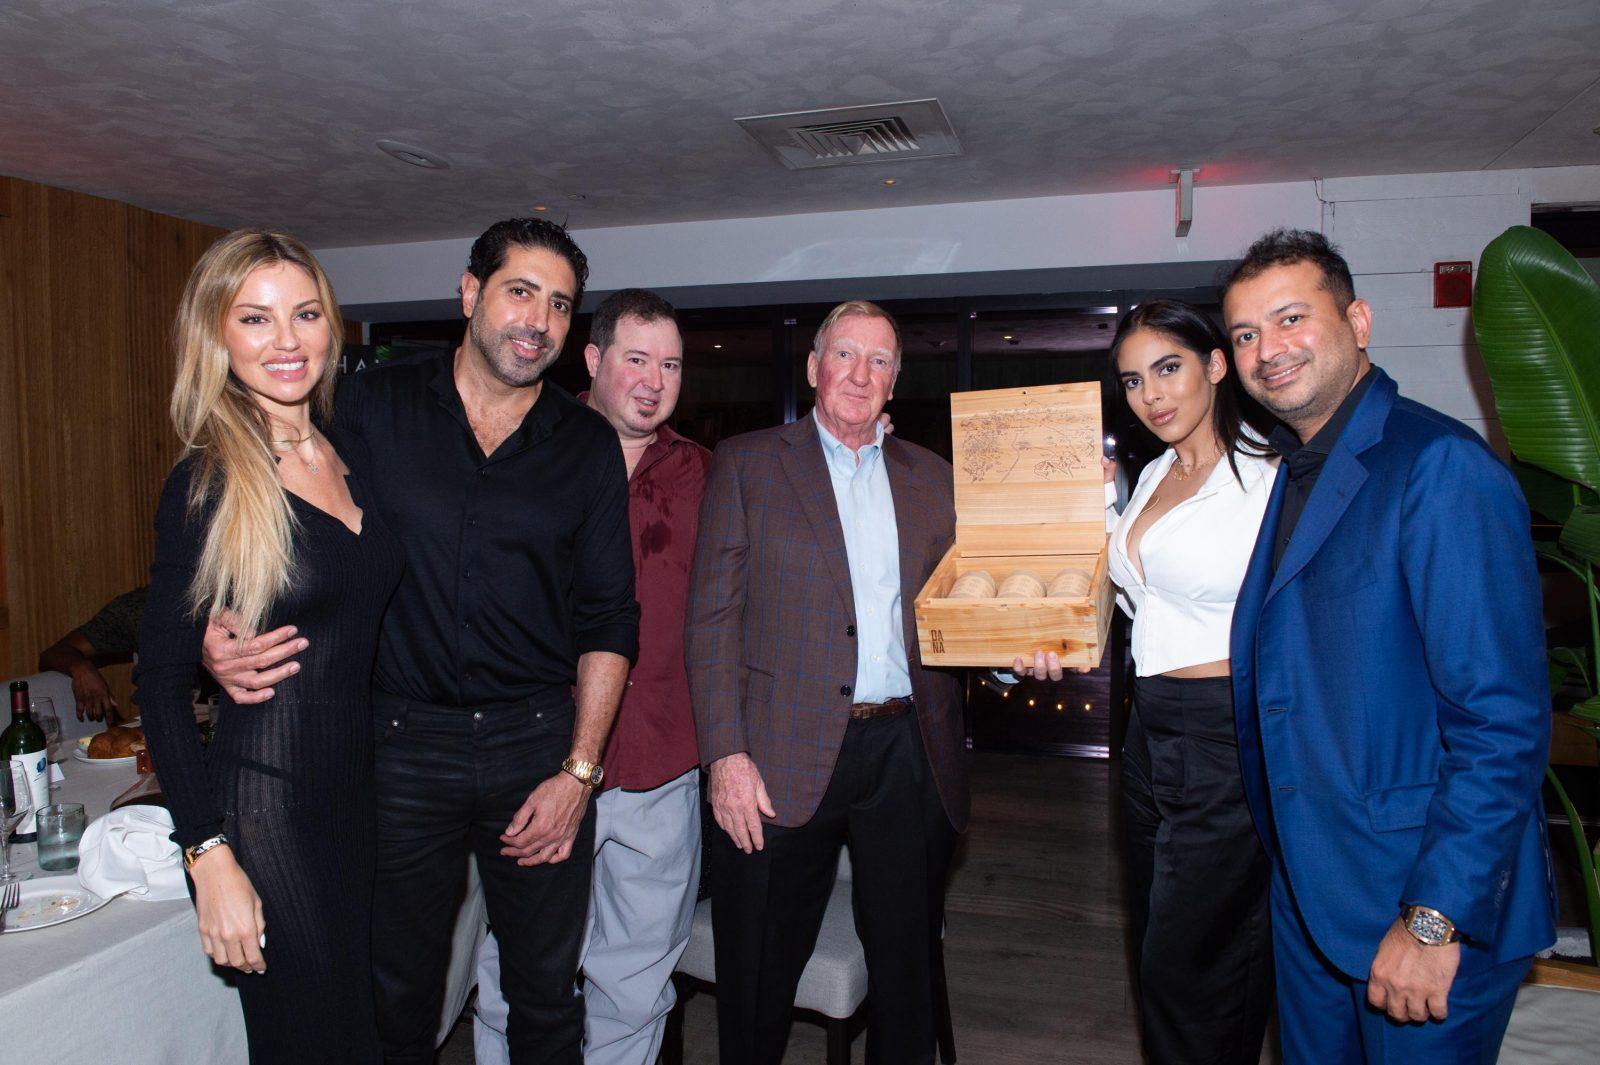 Marianne Dietrich, Tommy Kato, Greg Mirmelli, John Lee, Deyvanshi Masrani and Kamal Hotchandani